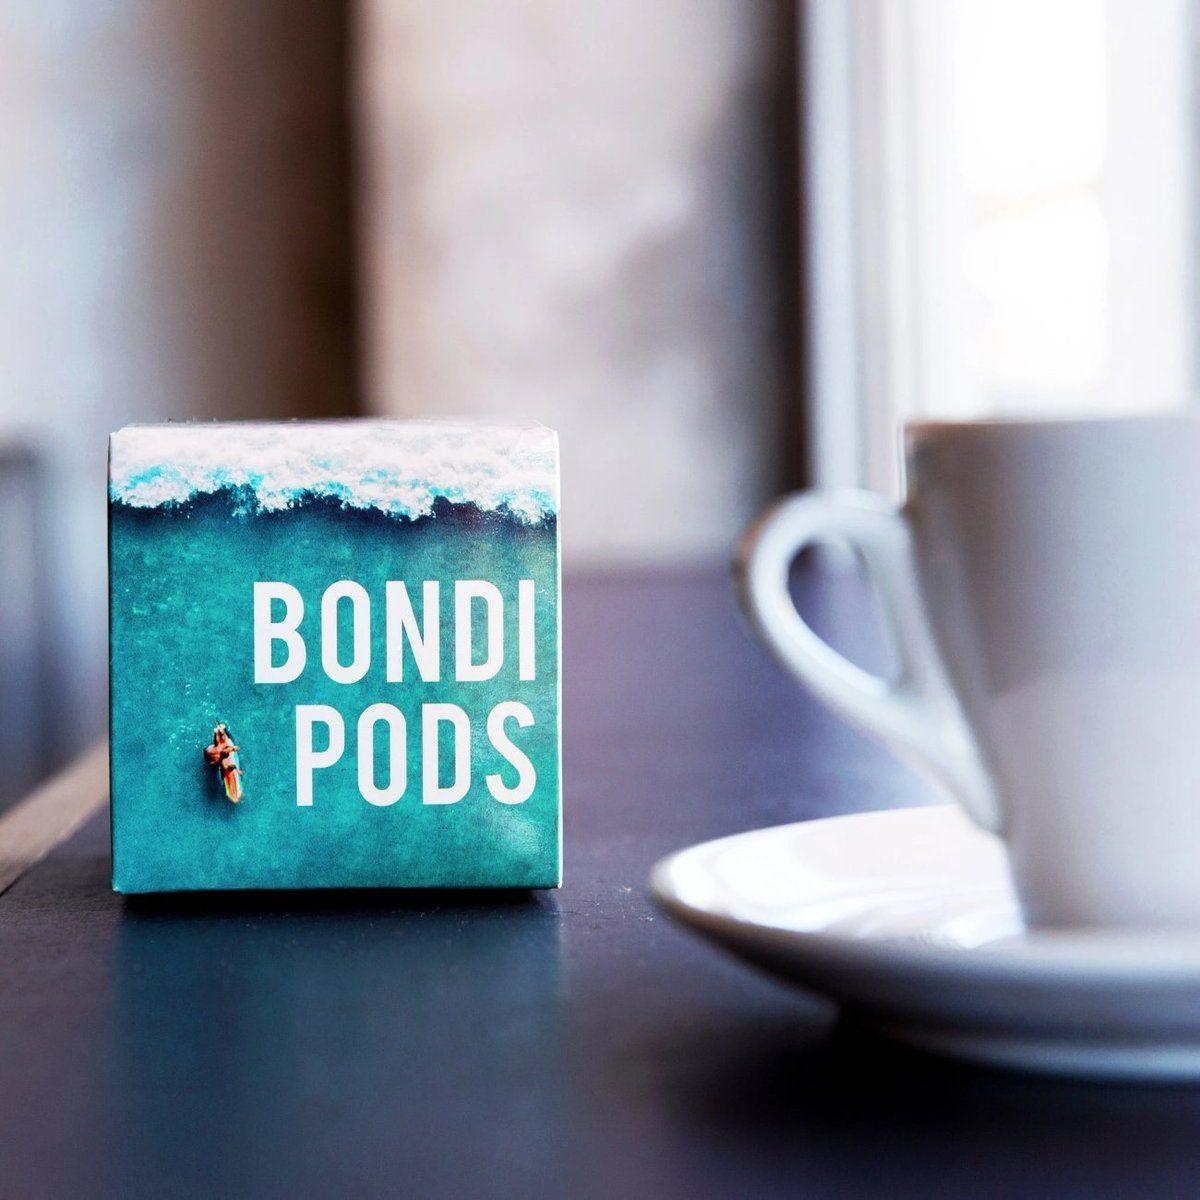 Coffee pods mocha 10 packcoffee mocha pack pods